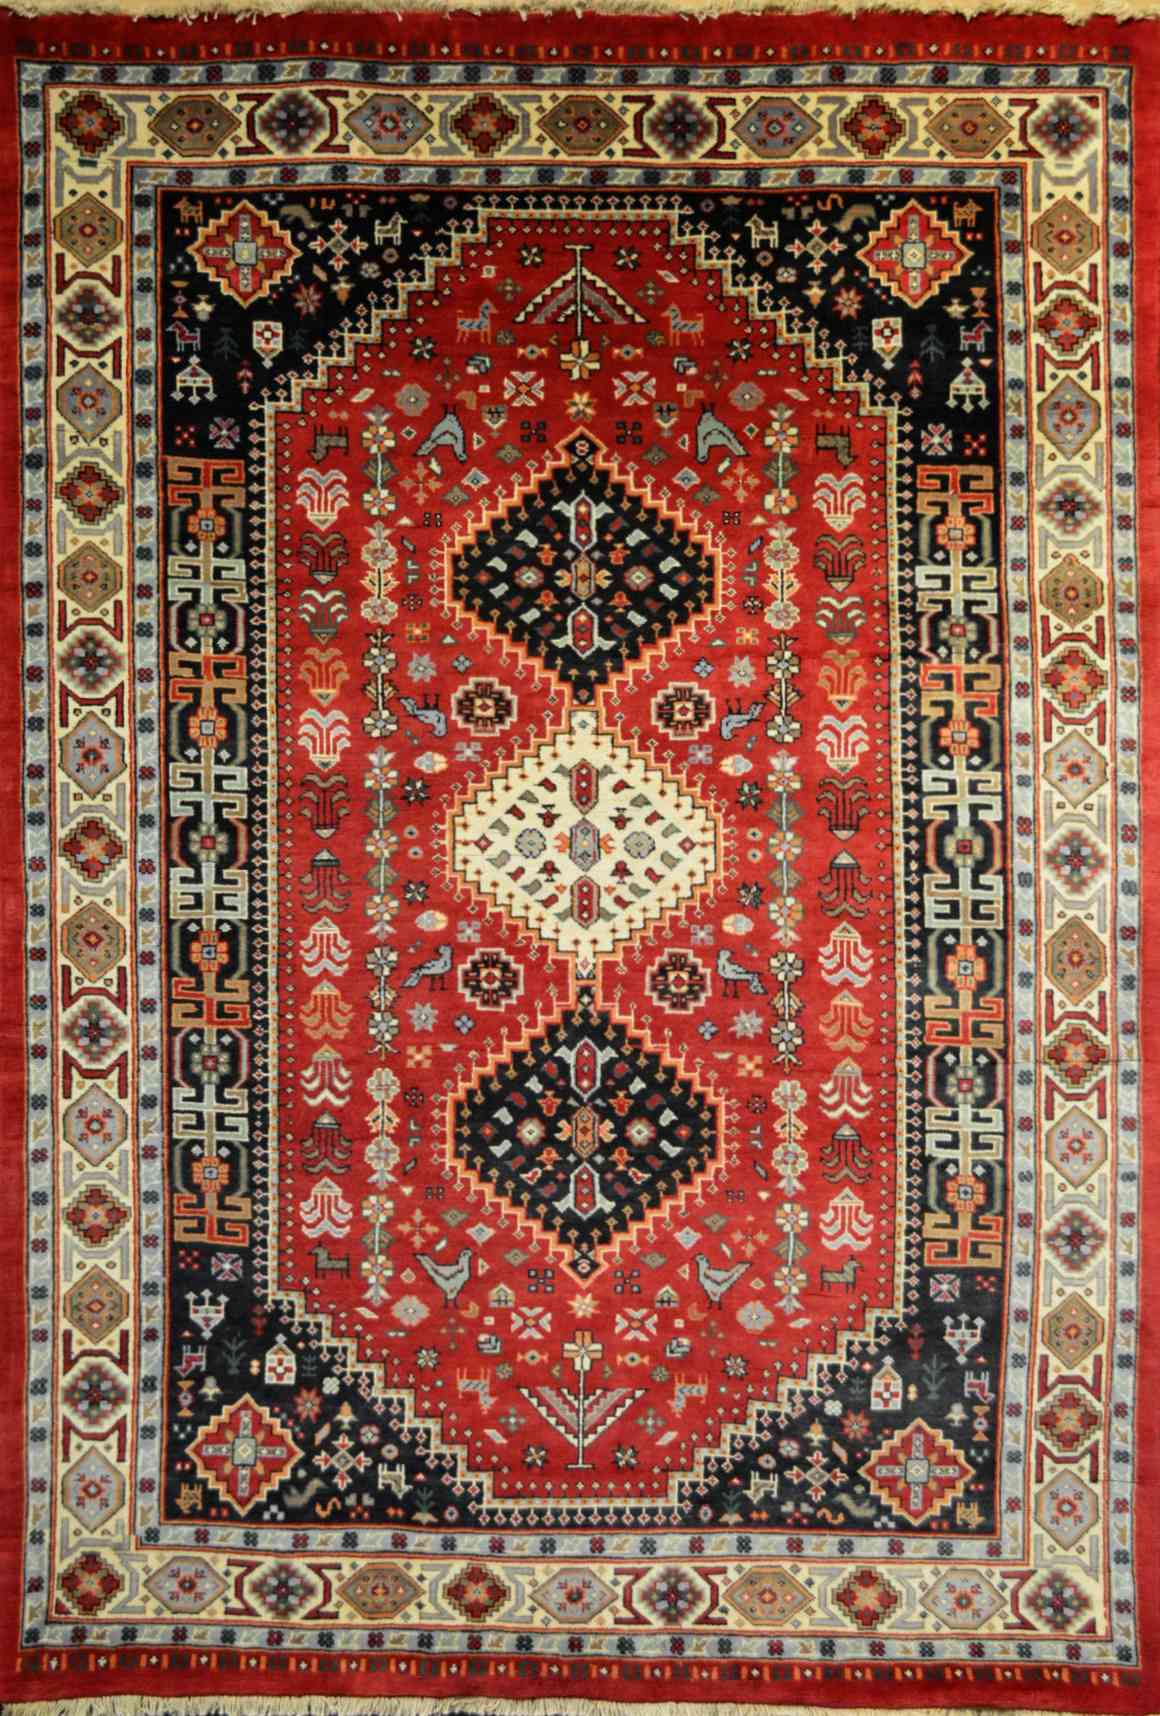 Qashqai 7 11 X 5 6 Montreal Carpet Store Bashir